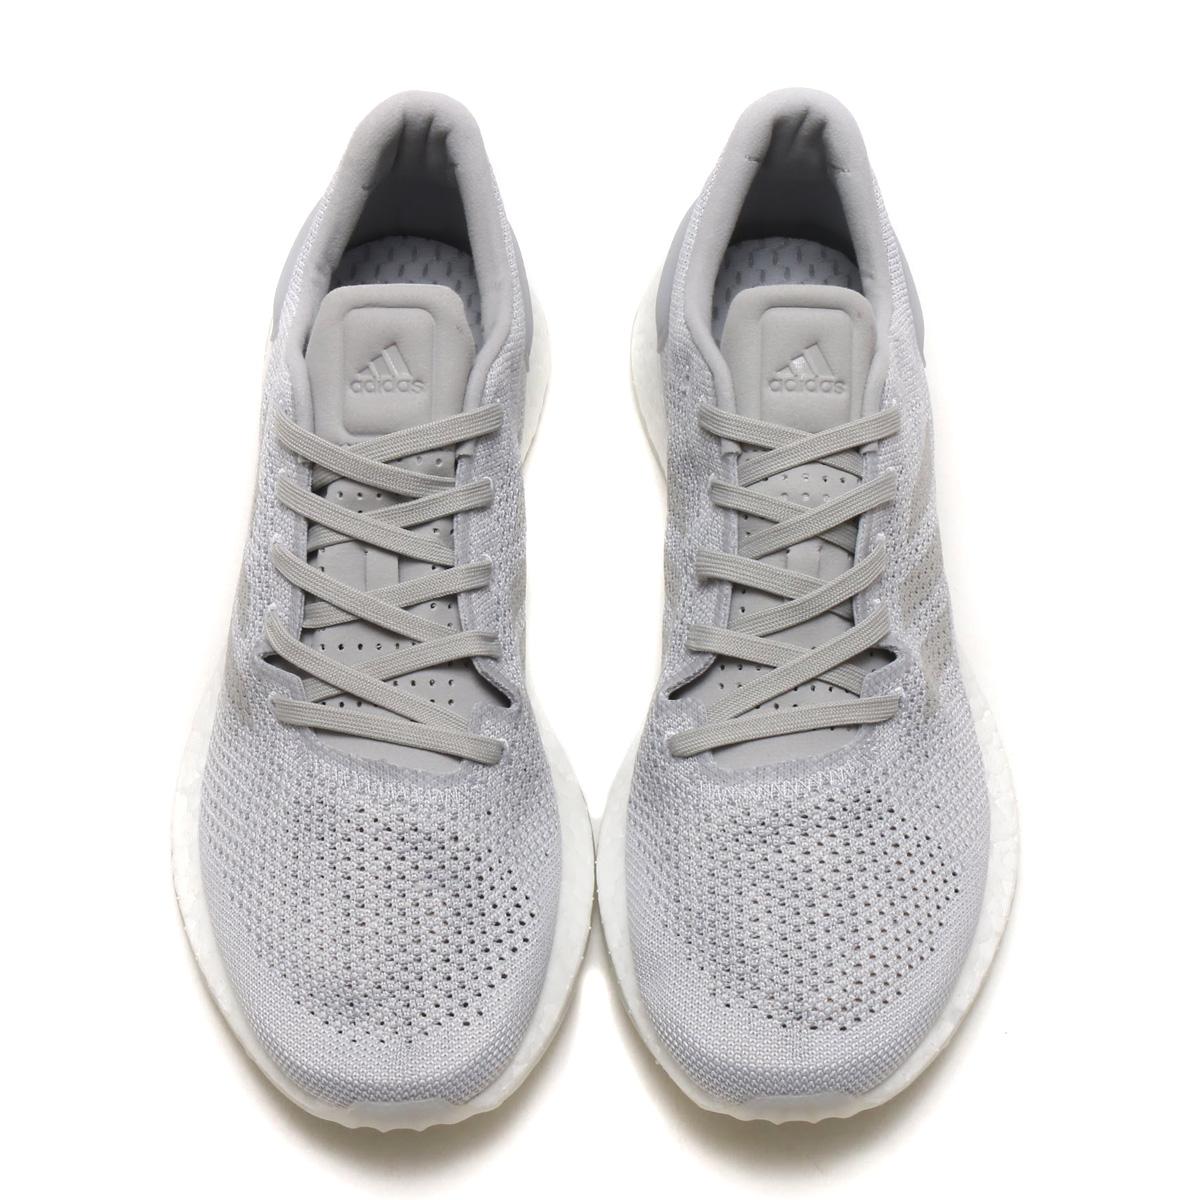 dc4a7d12b7f1c adidas Originals PureBOOST DPR LTD (Adidas originals pure boost DPR LTD)  (gray TWO F17  gray TWO F17  running white) 18SS-I